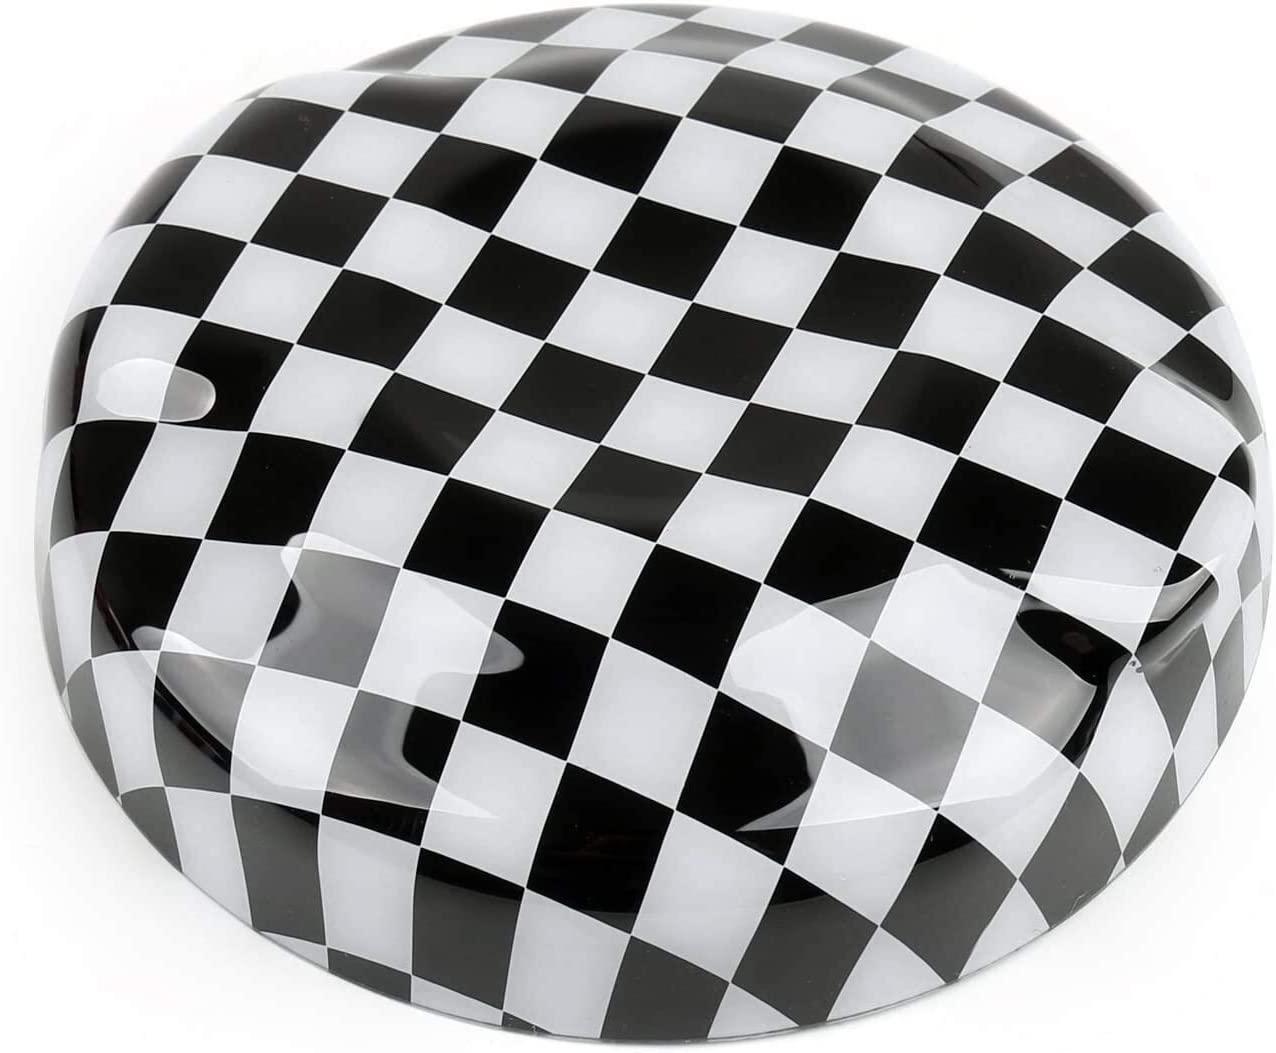 for Mini Cooper Gen3 F55S 2015 +, F56S 2014 +, F57S 2016 + Fuel Tank Cap, Car Oil Fuel Filler Racing Engine Tank Cap Cover Plug (Color : Black White)